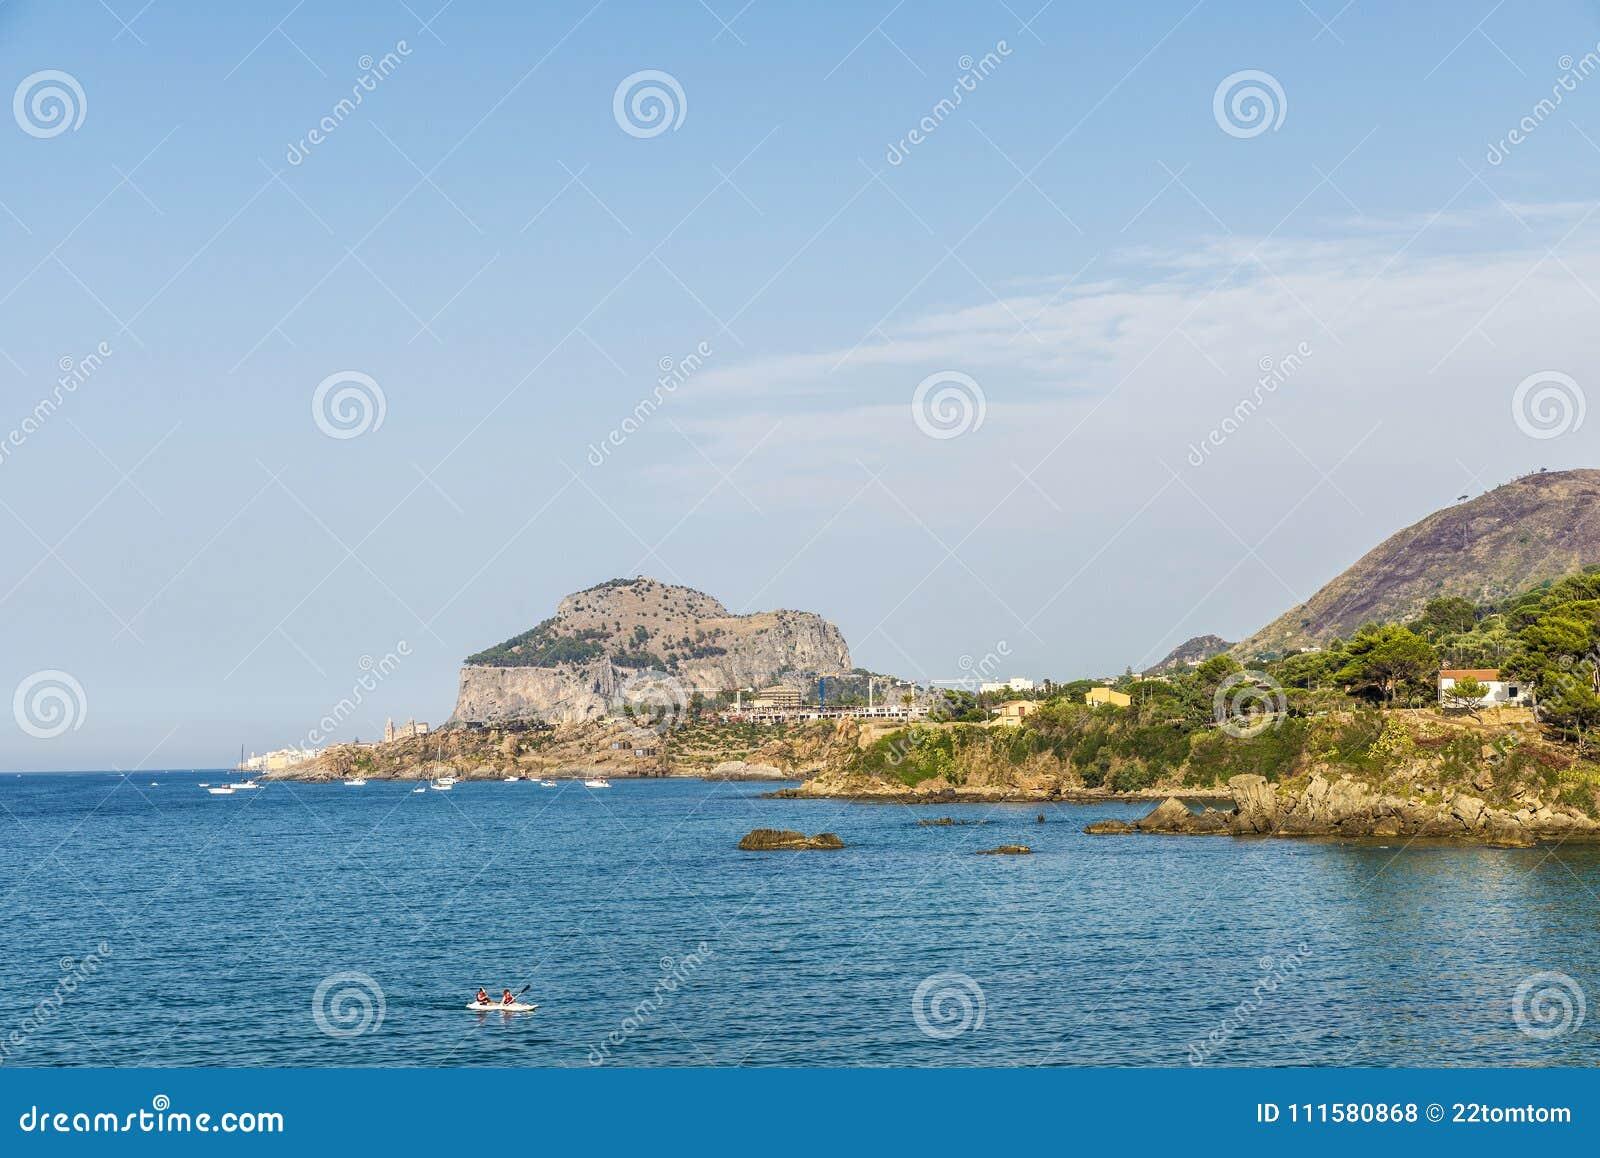 Kajaksegeln entlang der Küste in Sizilien, Italien